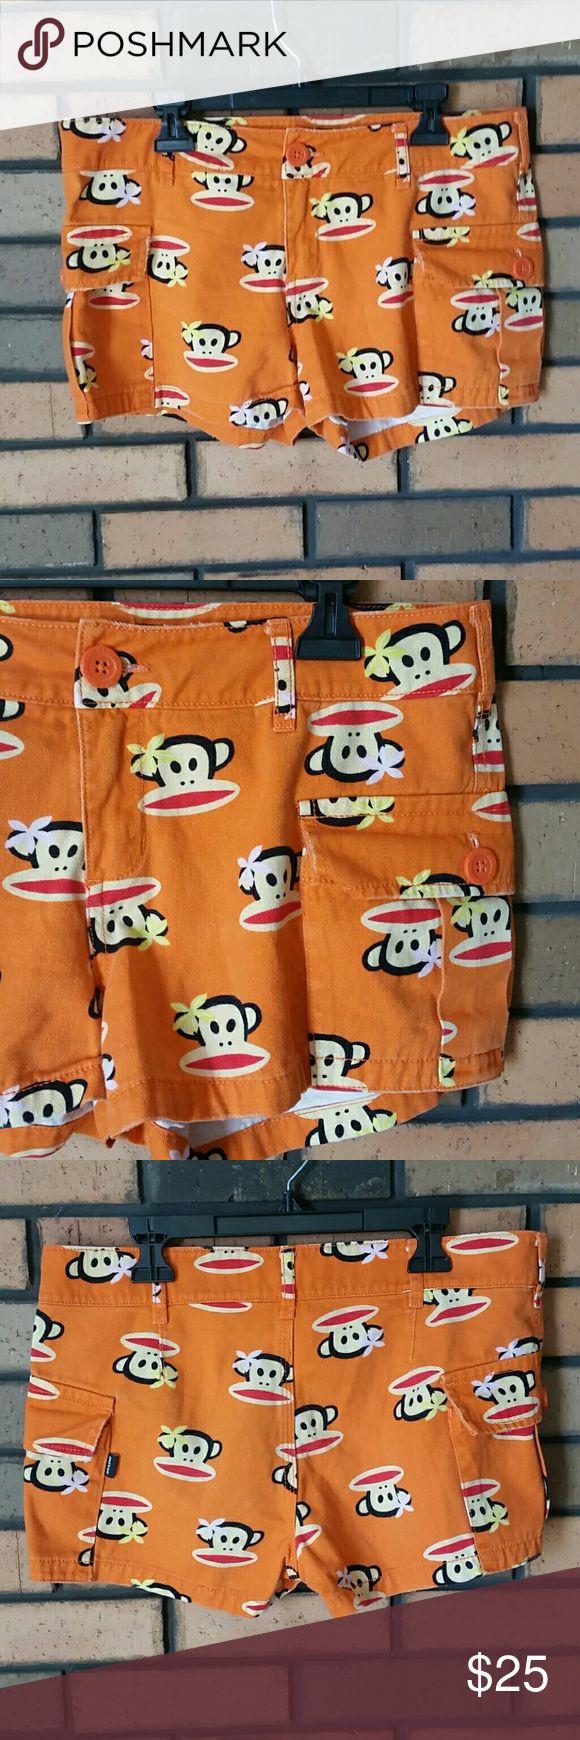 "Women's Paul Frank orange Monkey shorts Such fun shorts! Waist measures 15.5"" laying flat, 2"" inseam. I discount bundles! Make me an offer! Paul Frank Shorts"